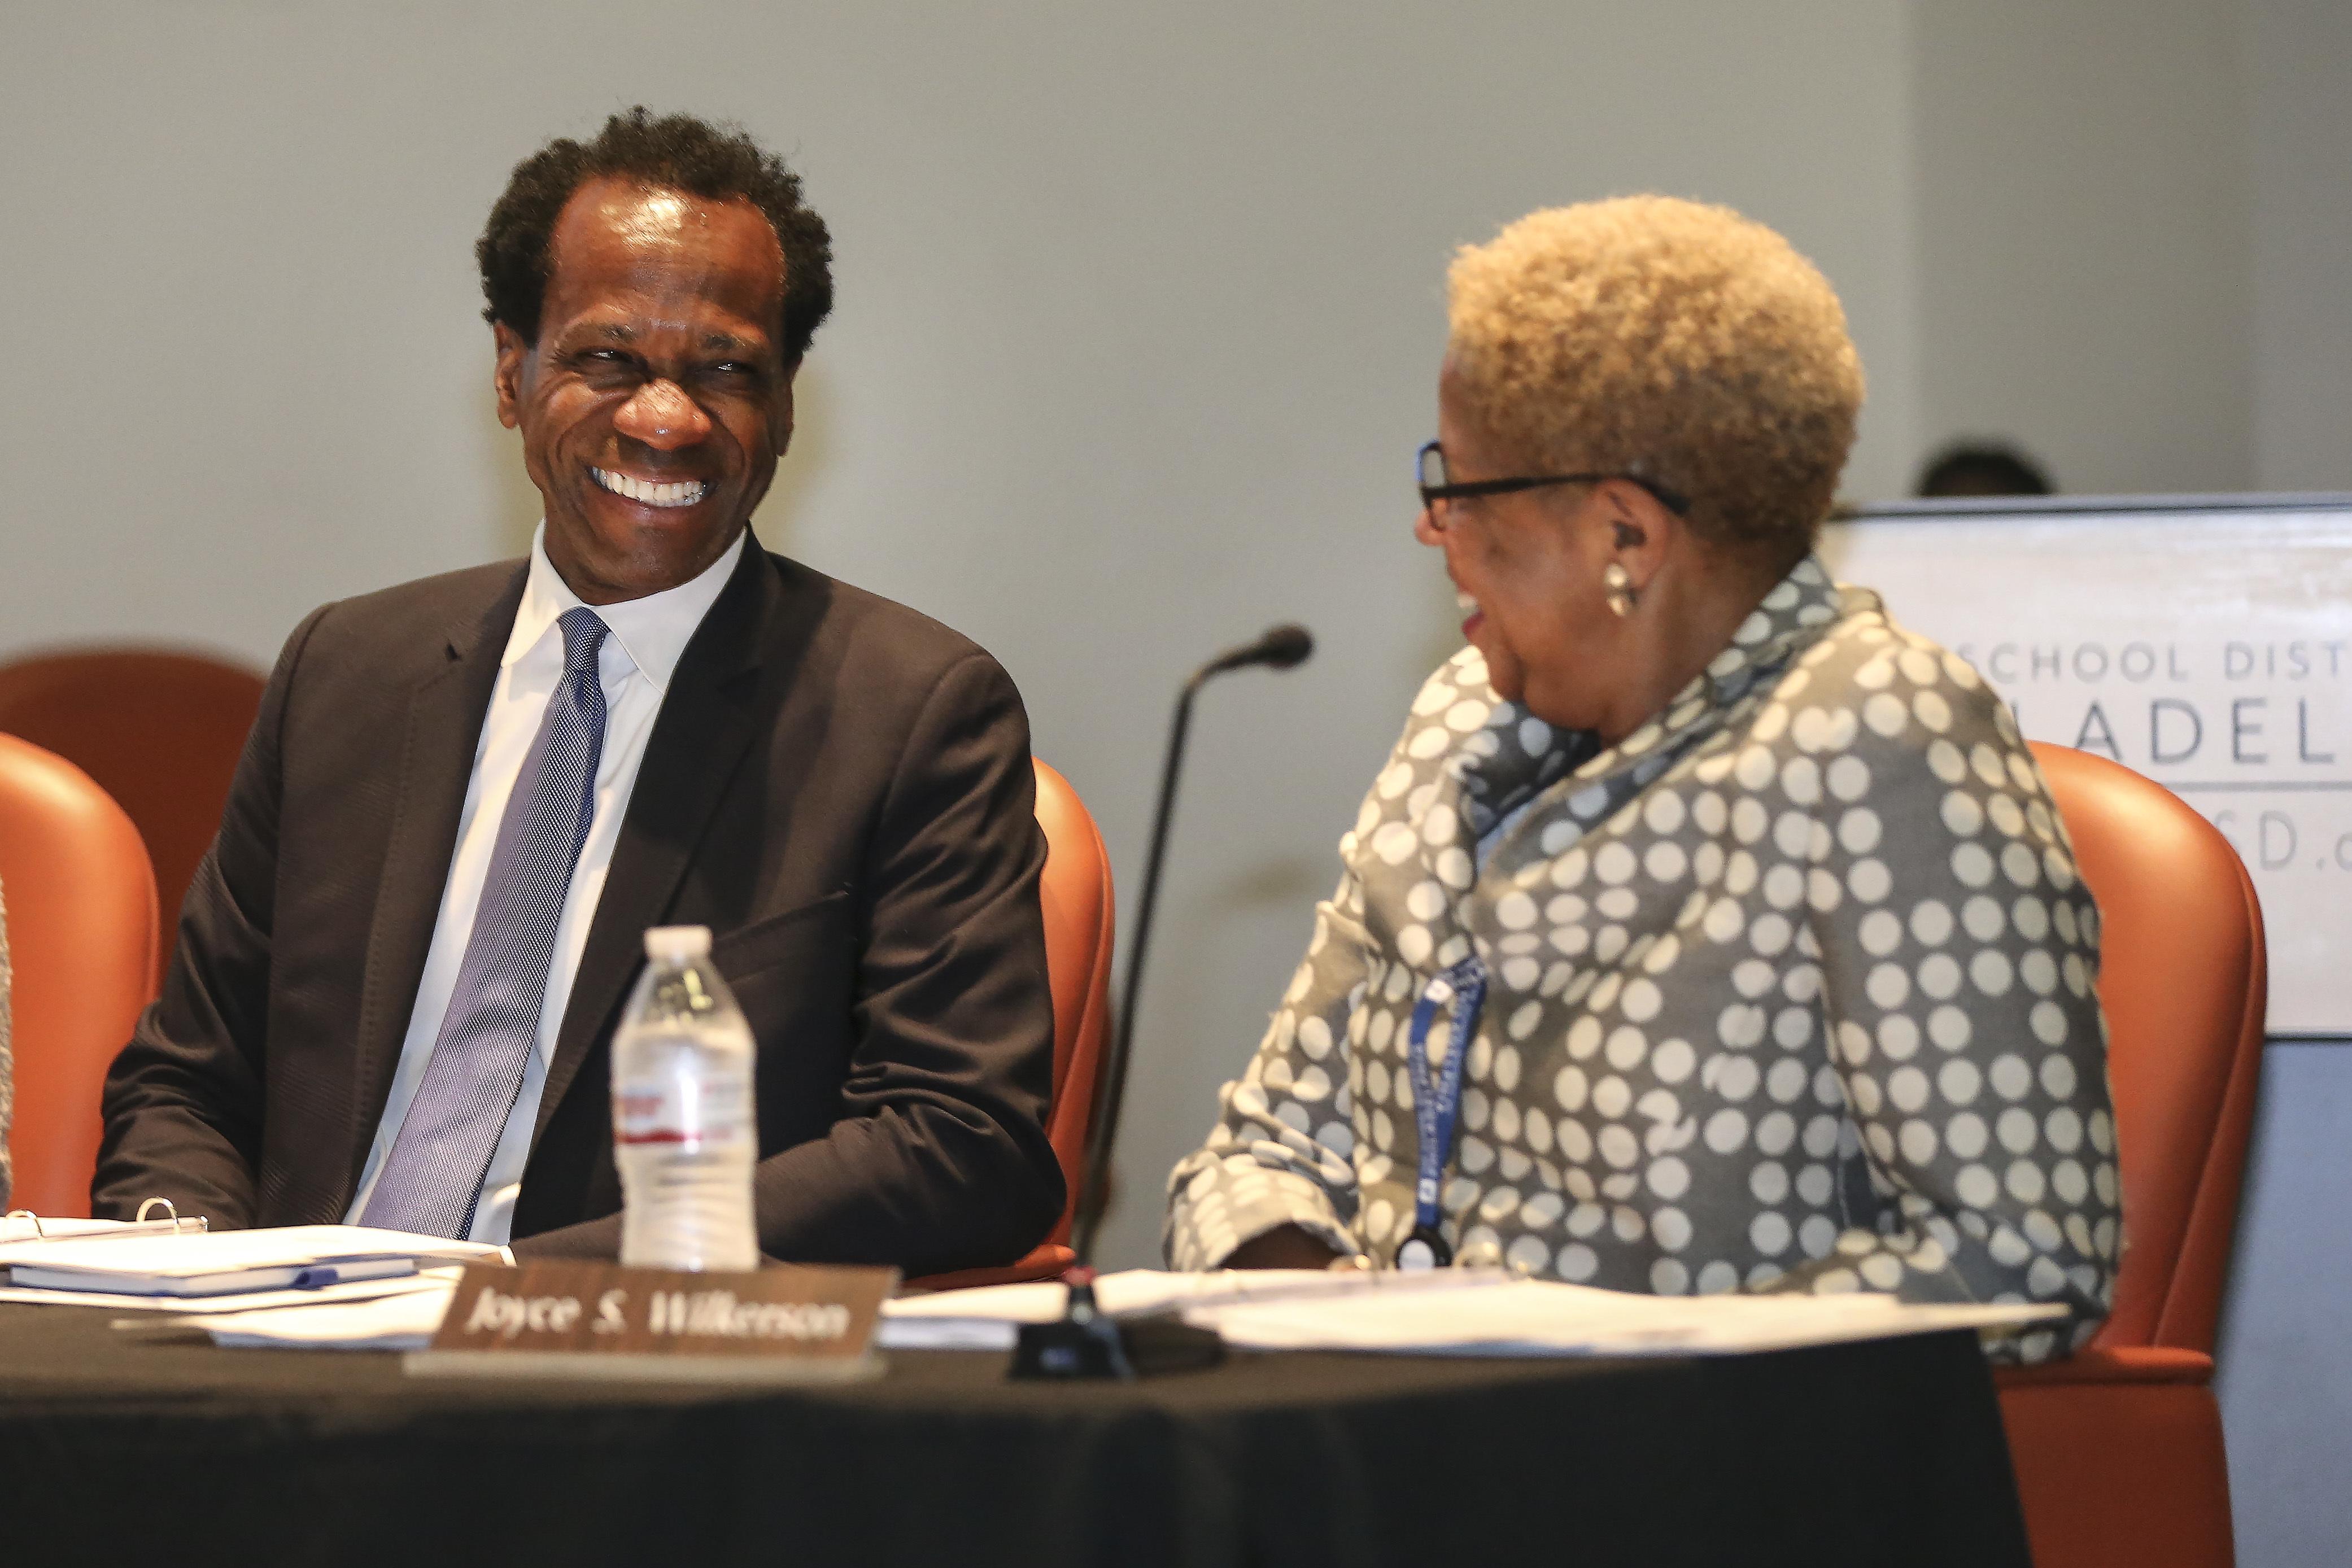 New Philadelphia School Board, Vice President Wayne Walker and President Joyce Wilkerson share a light momnet, Monday, July 9, 2018. STEVEN M. FALK / Staff Photographer